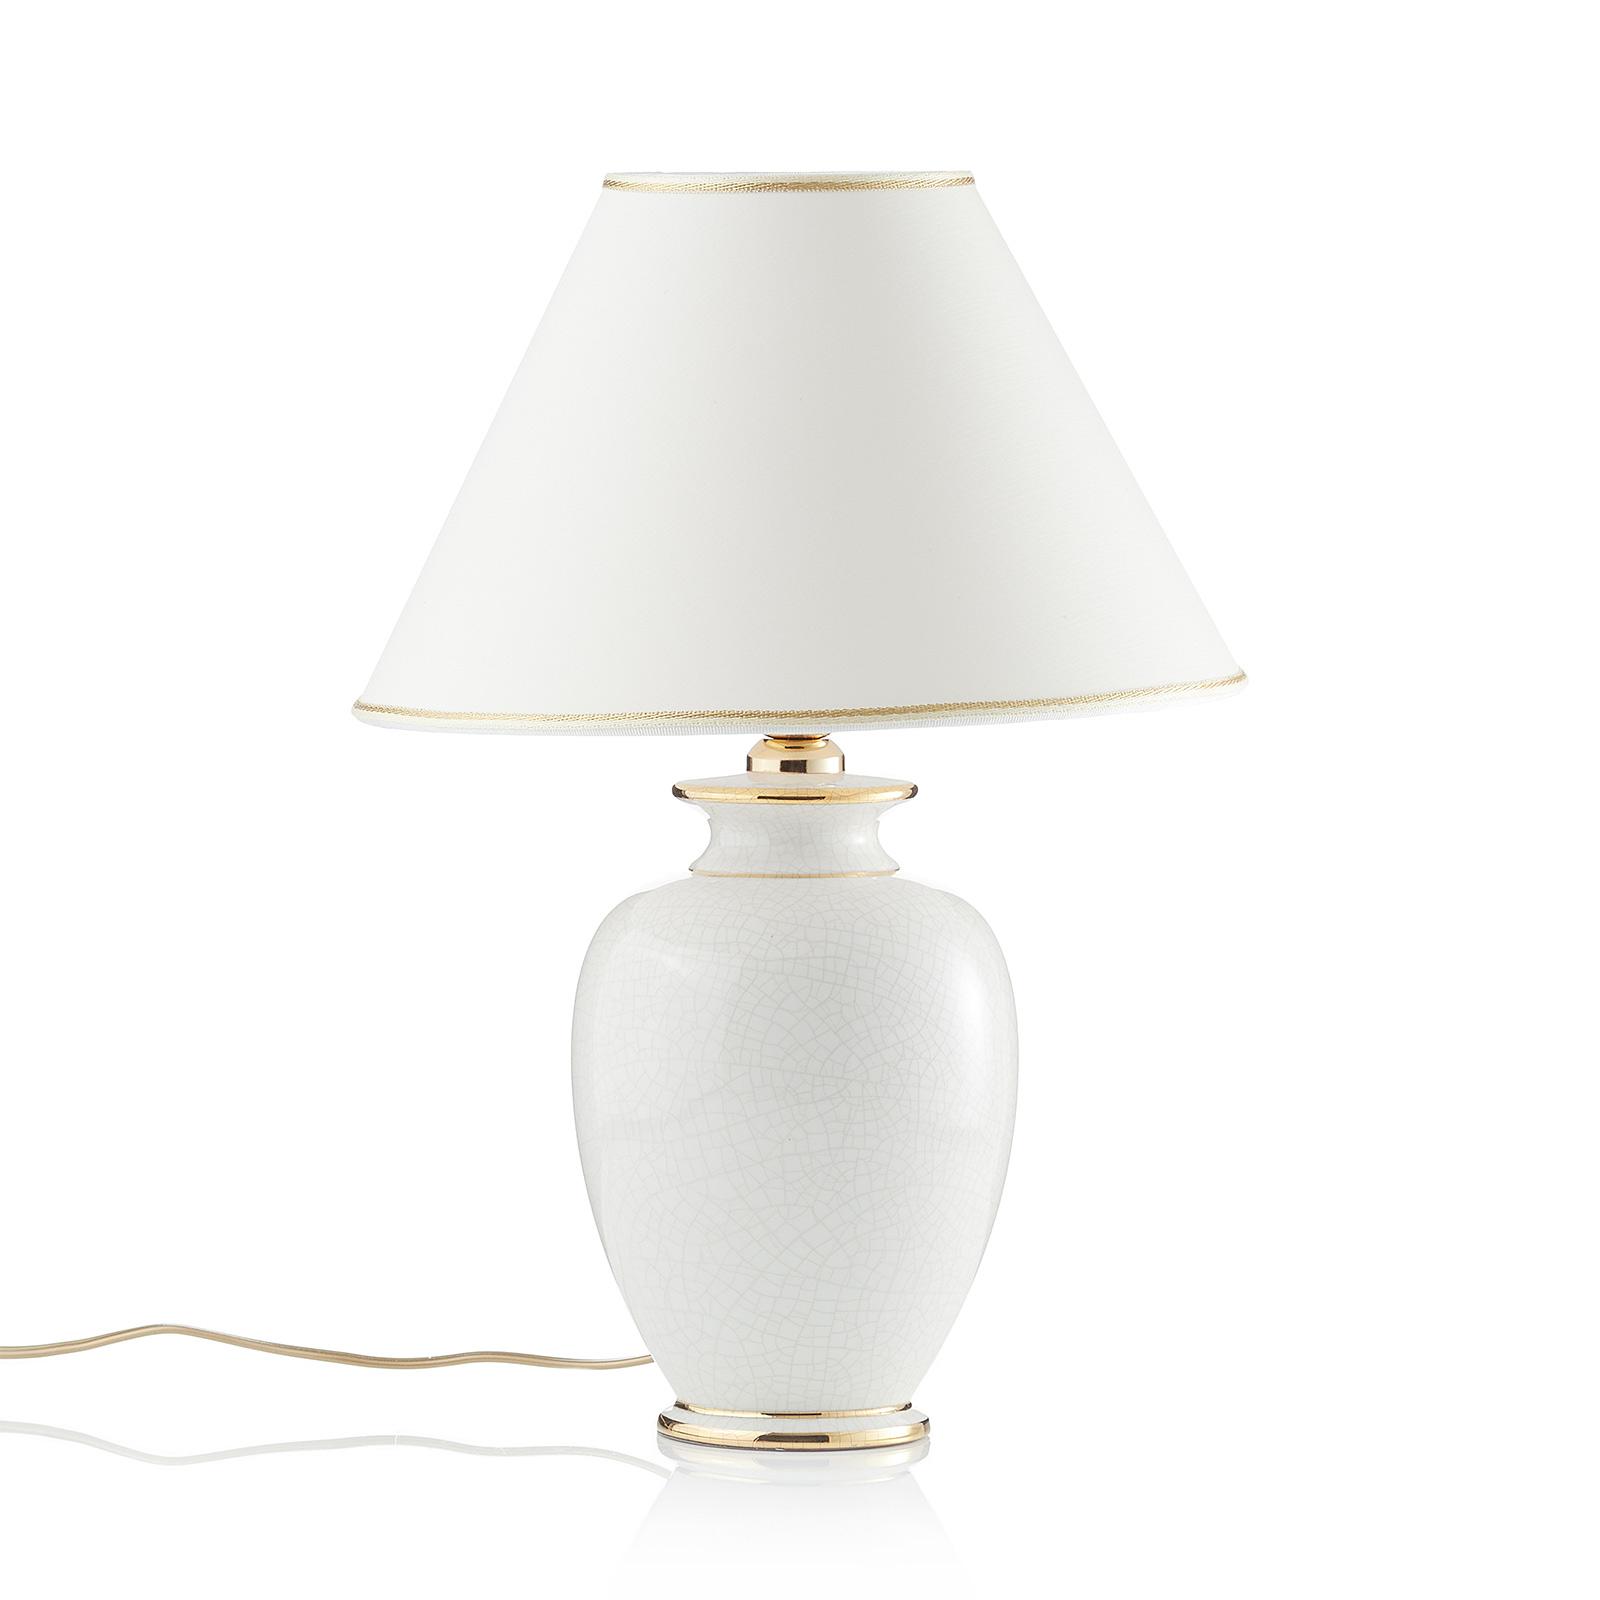 KOLARZ Giardino Craclee - weiße Tischleuchte 30 cm